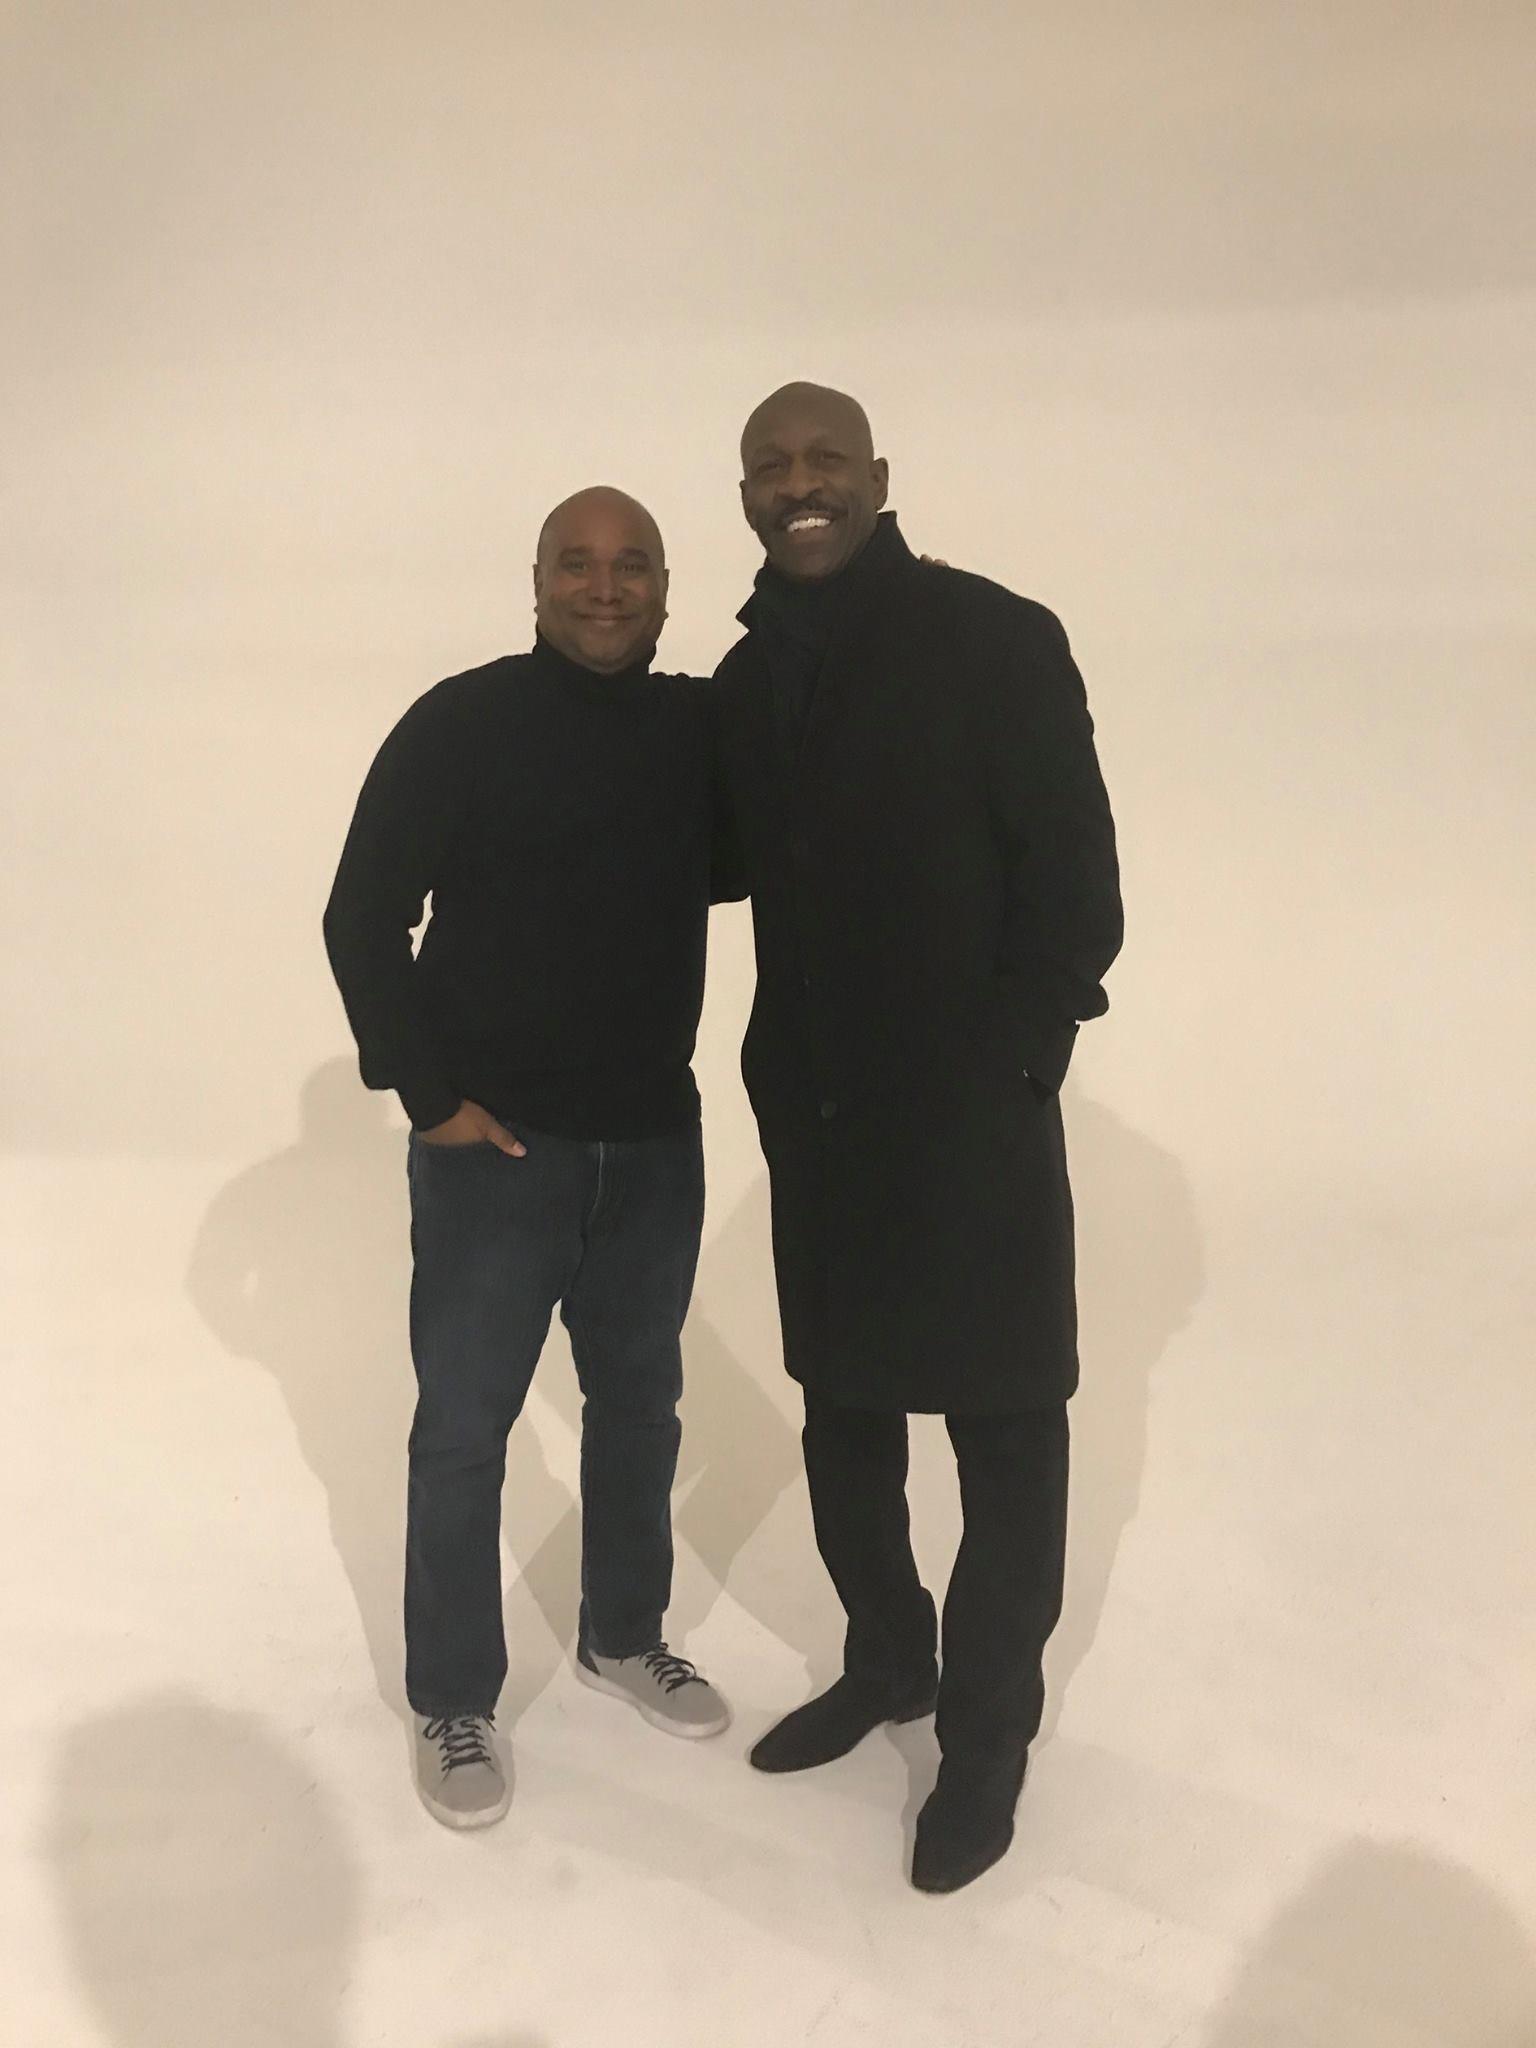 Coach & I at the photo shoot last December